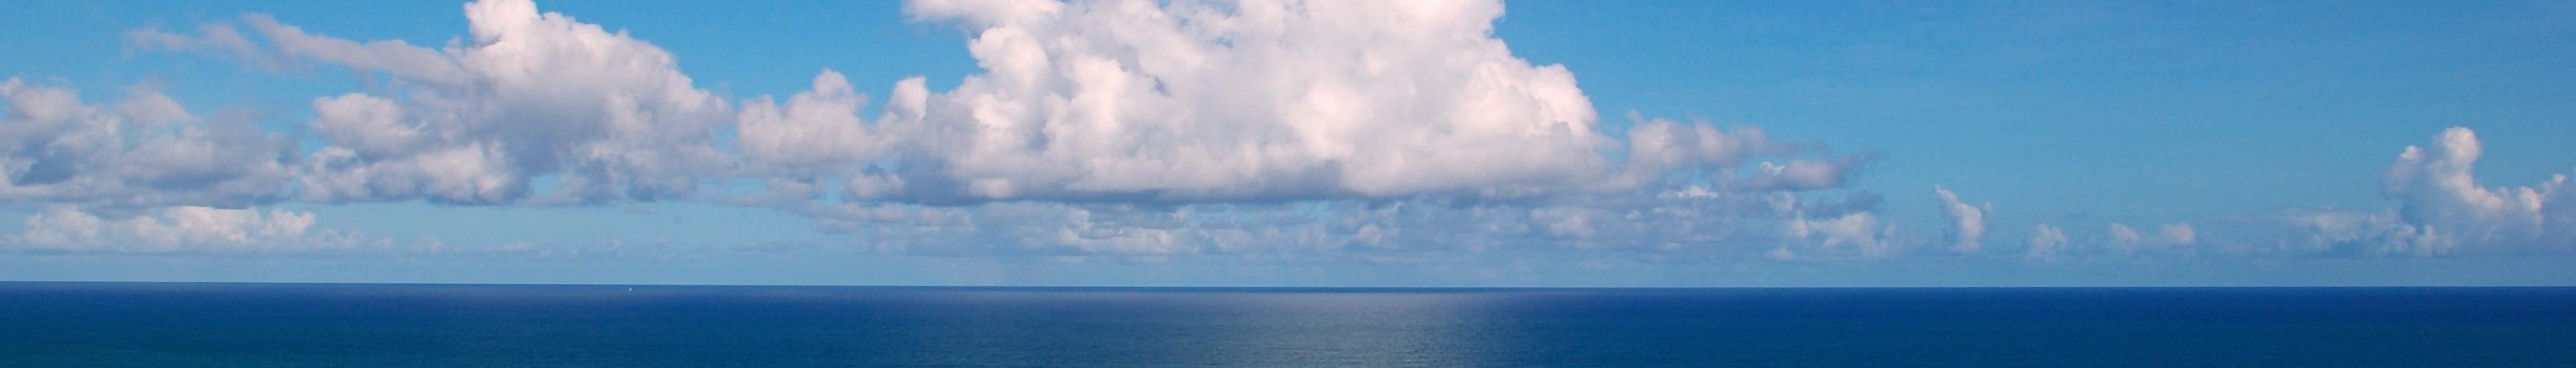 File:Atlantic Ocean banner.jpg - Wikimedia Commons